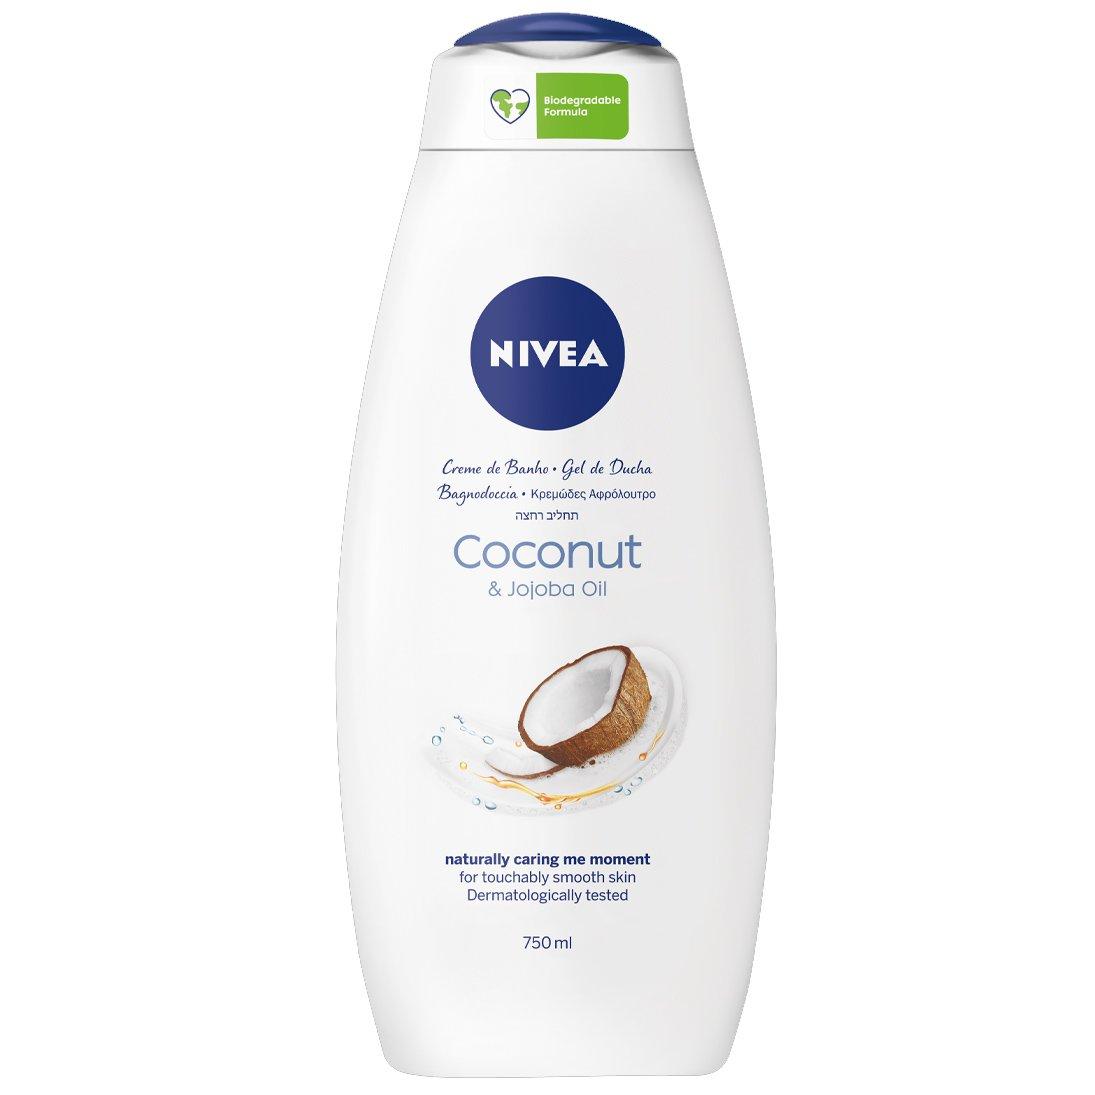 Nivea Coconut & Jojoba Oil Shower Cream Κρεμώδες Αφρόλουτρο με Λάδι Jojoba & Άρωμα Καρύδας 750ml